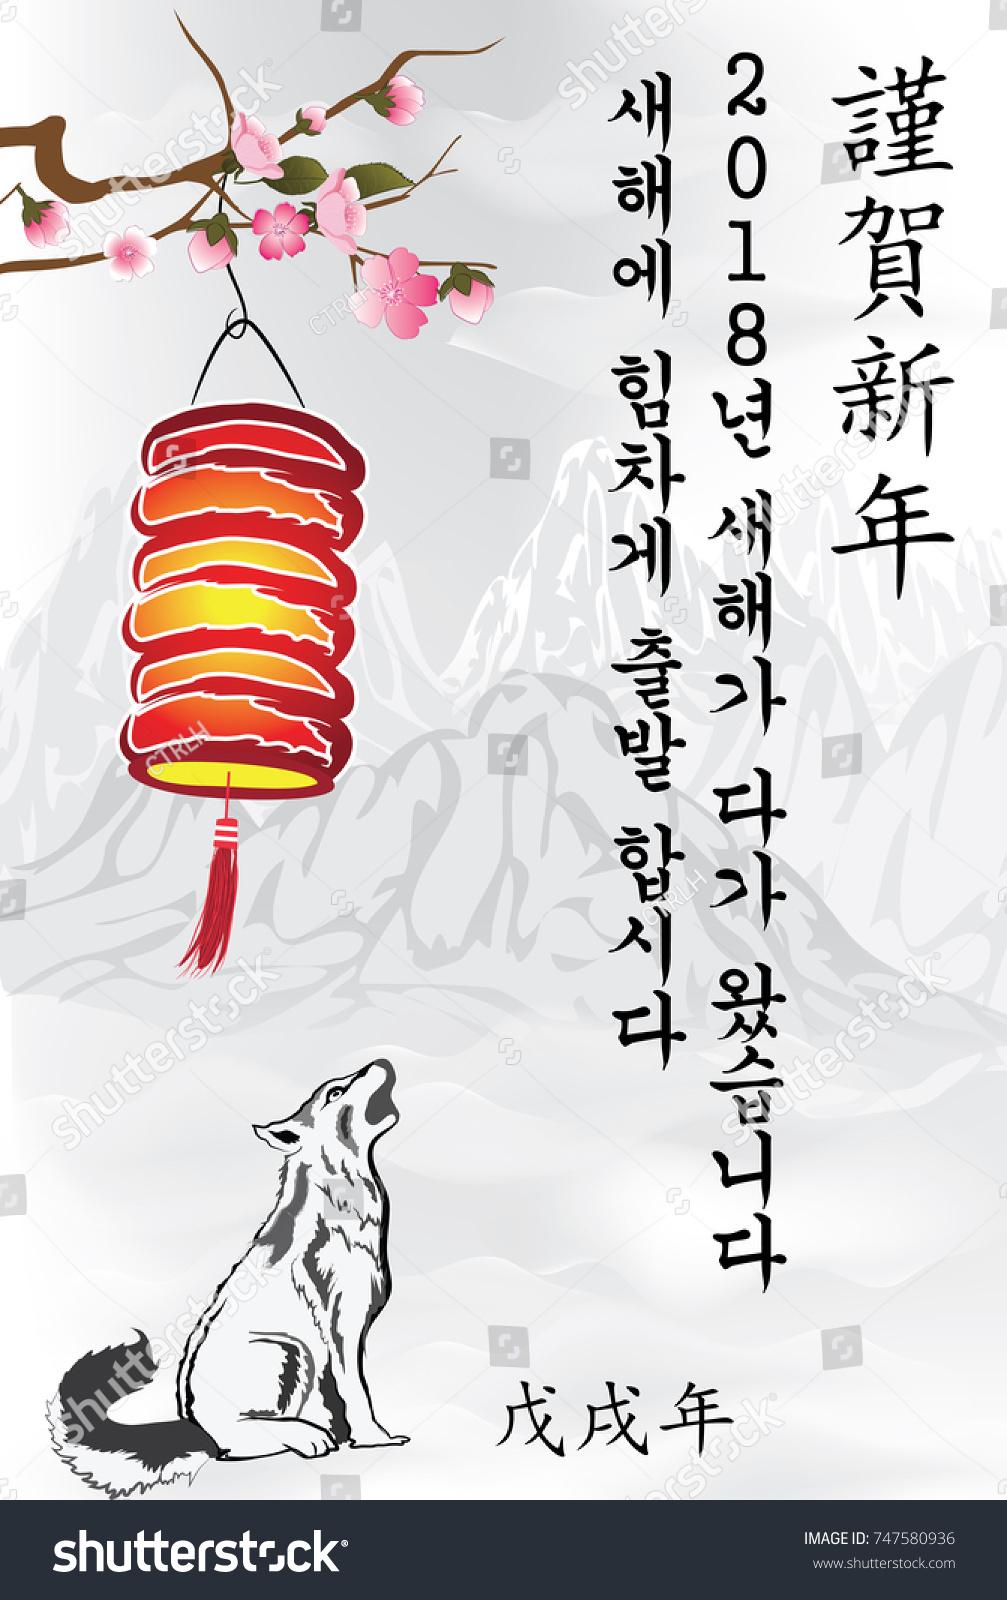 Greeting card korean spring festival text stock illustration greeting card for the korean spring festival text translation congratulations 2018 is approaching kristyandbryce Images